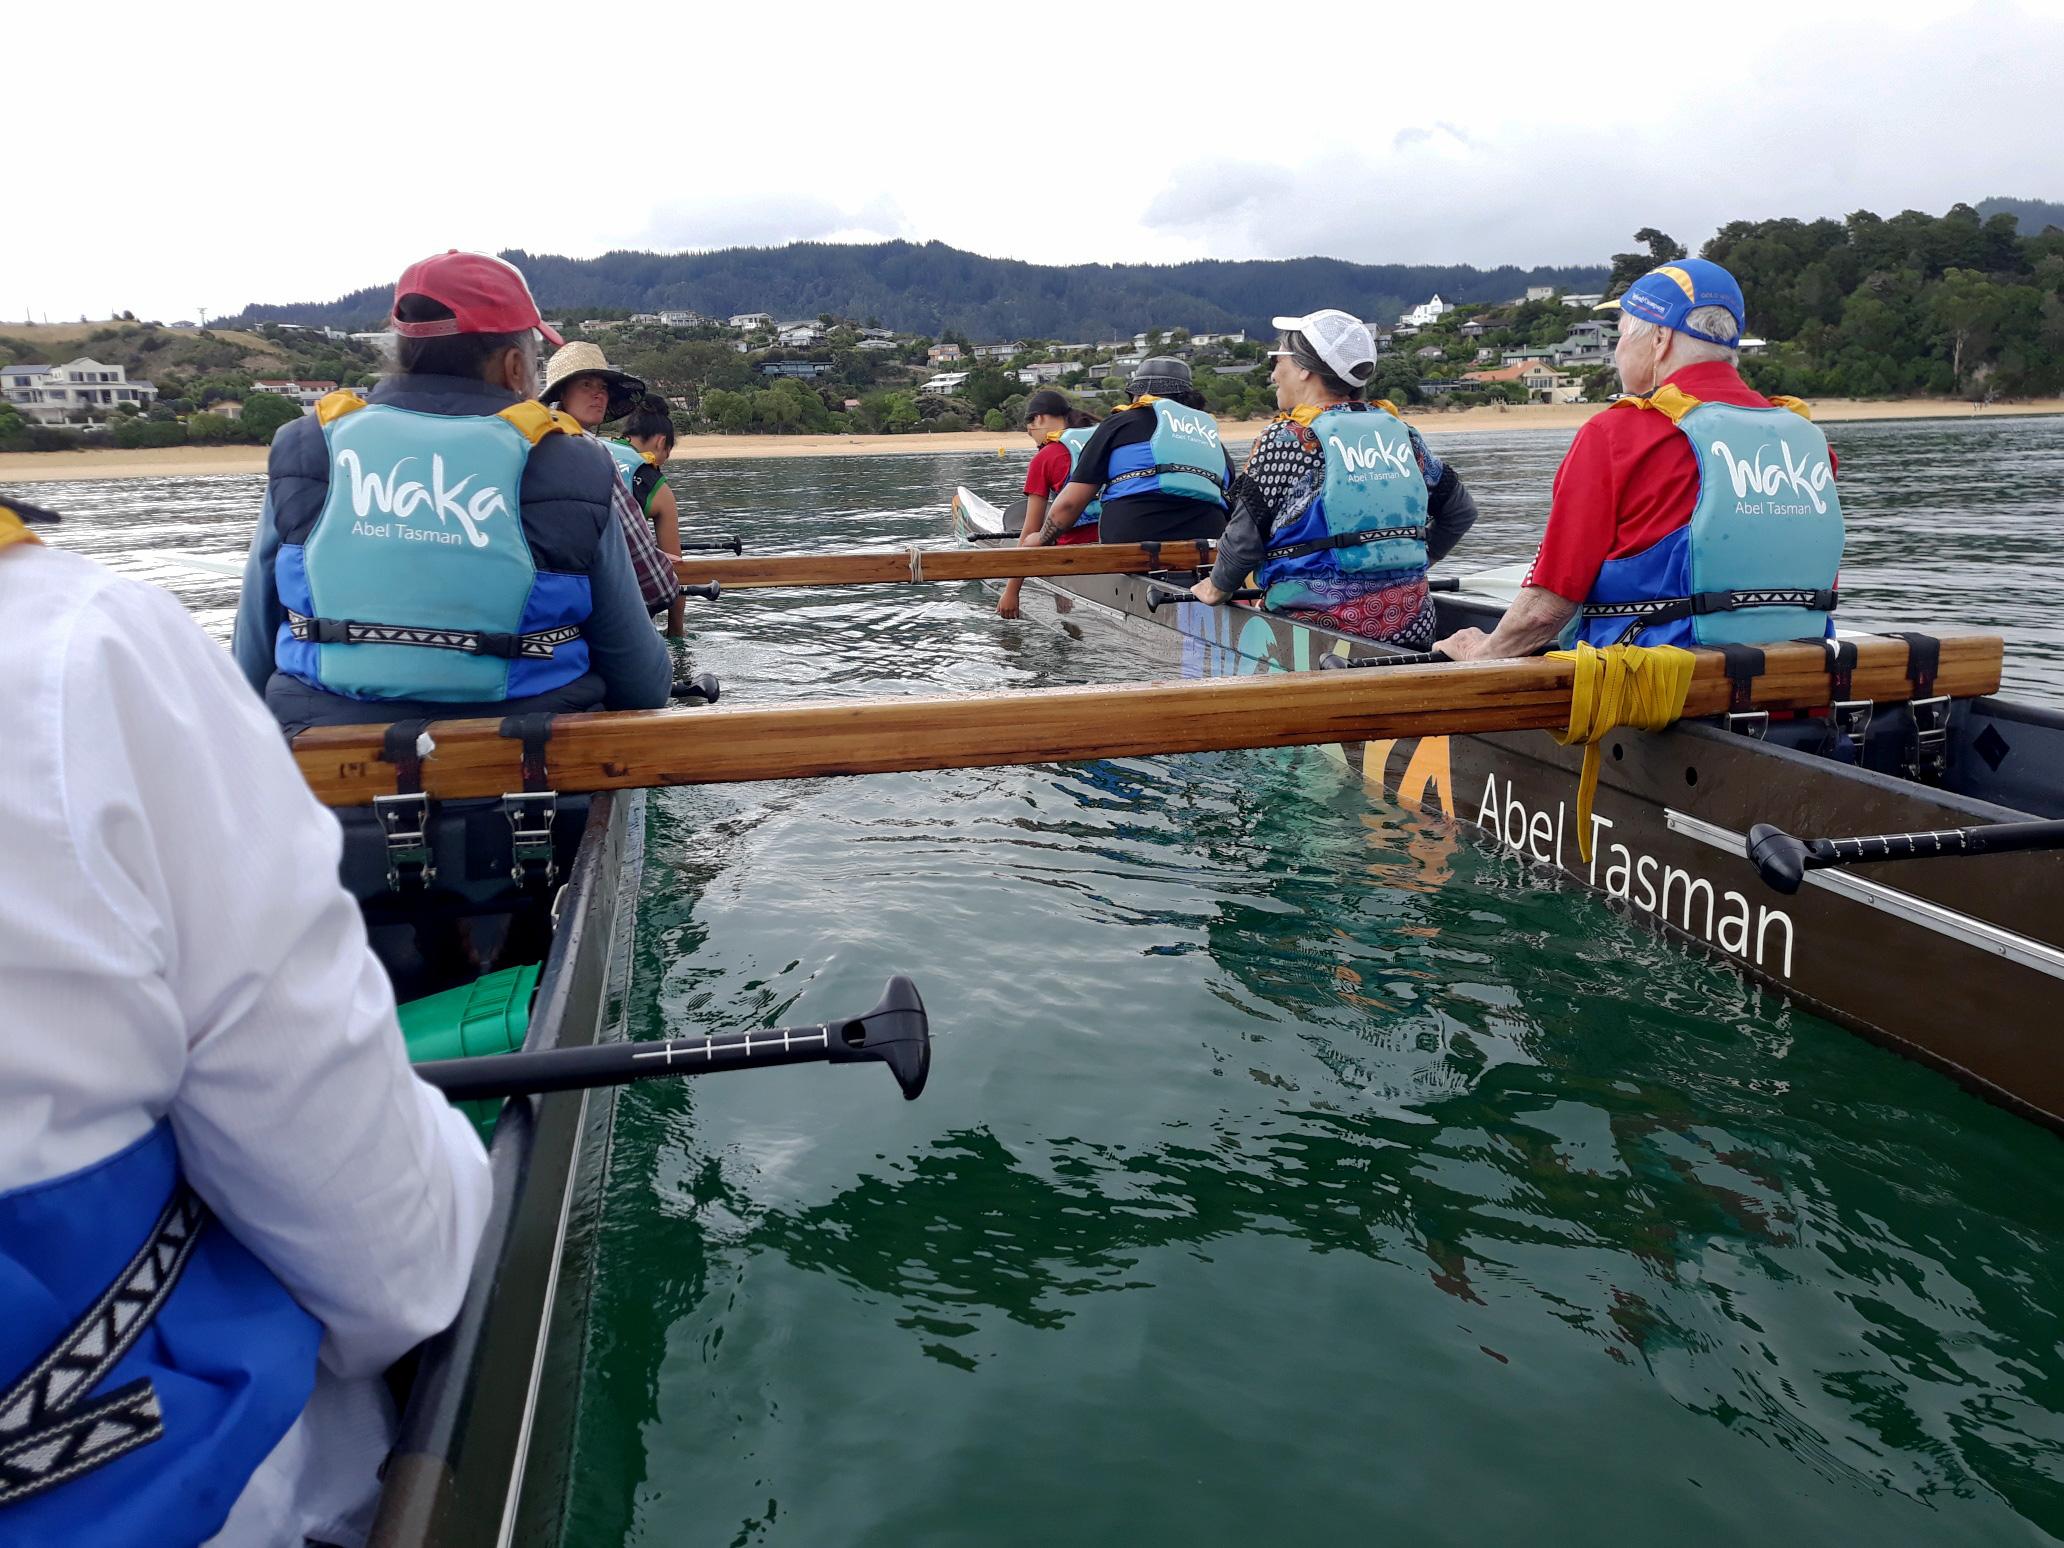 Thank you Waka Abel Tasman for allowing TPO to take our kaumātua for a paddle!